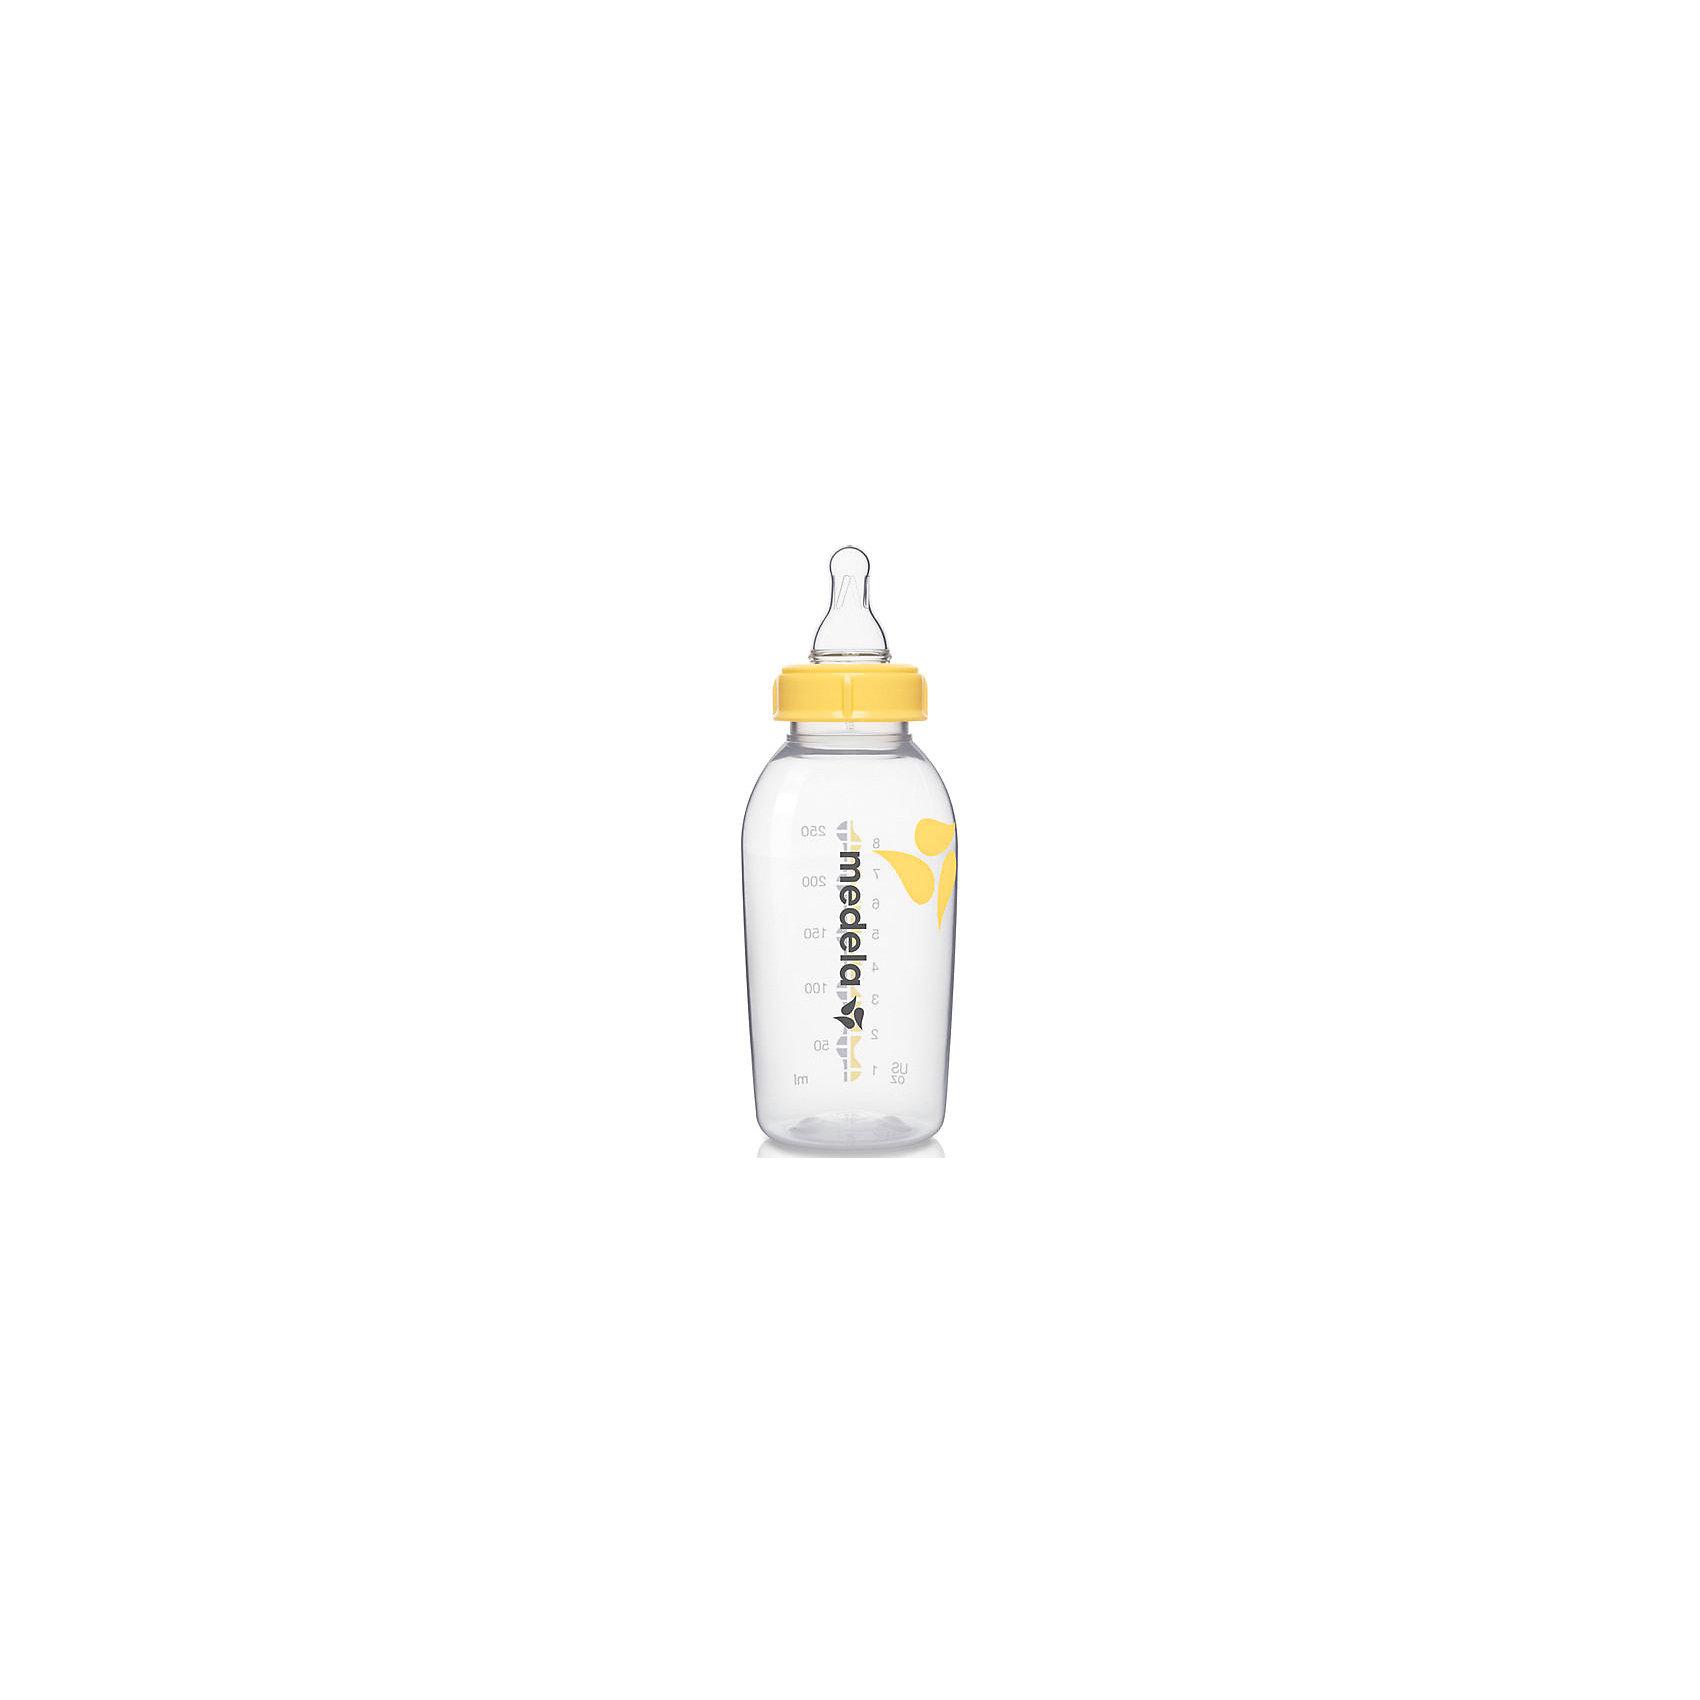 Бутылочка для кормления, 250 мл, Medela